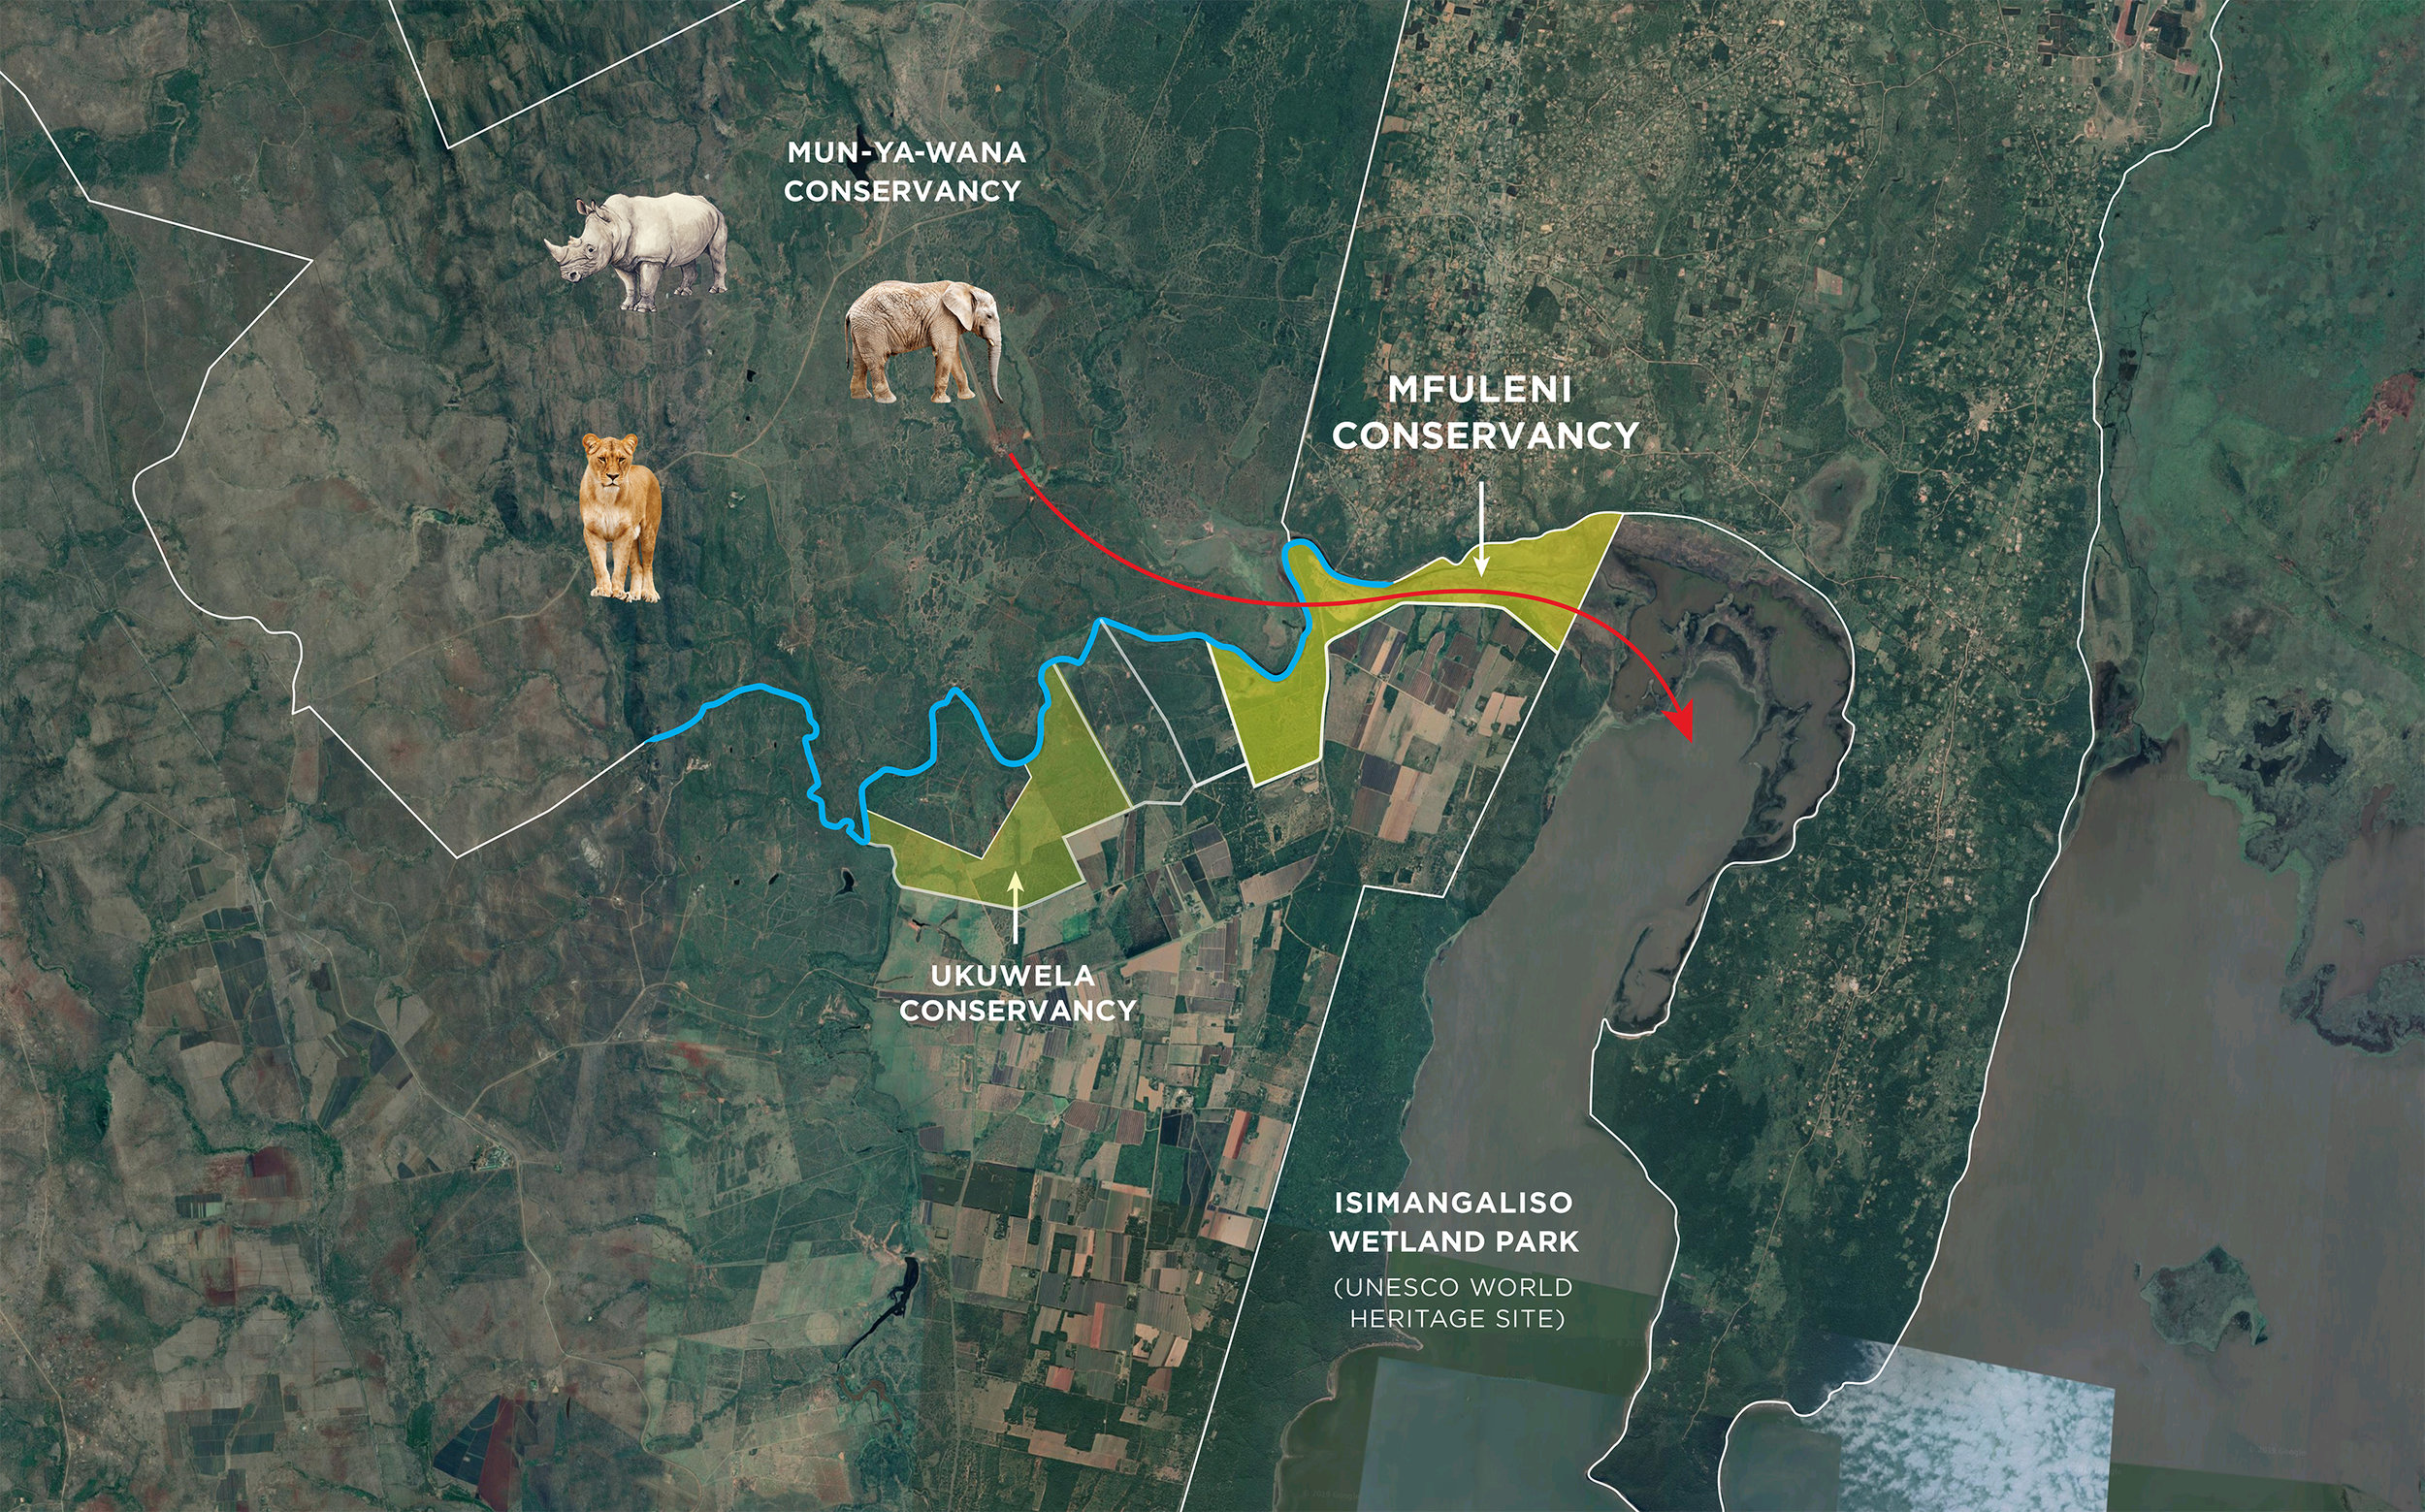 mfuleni conservancy map_pressrelease.jpg